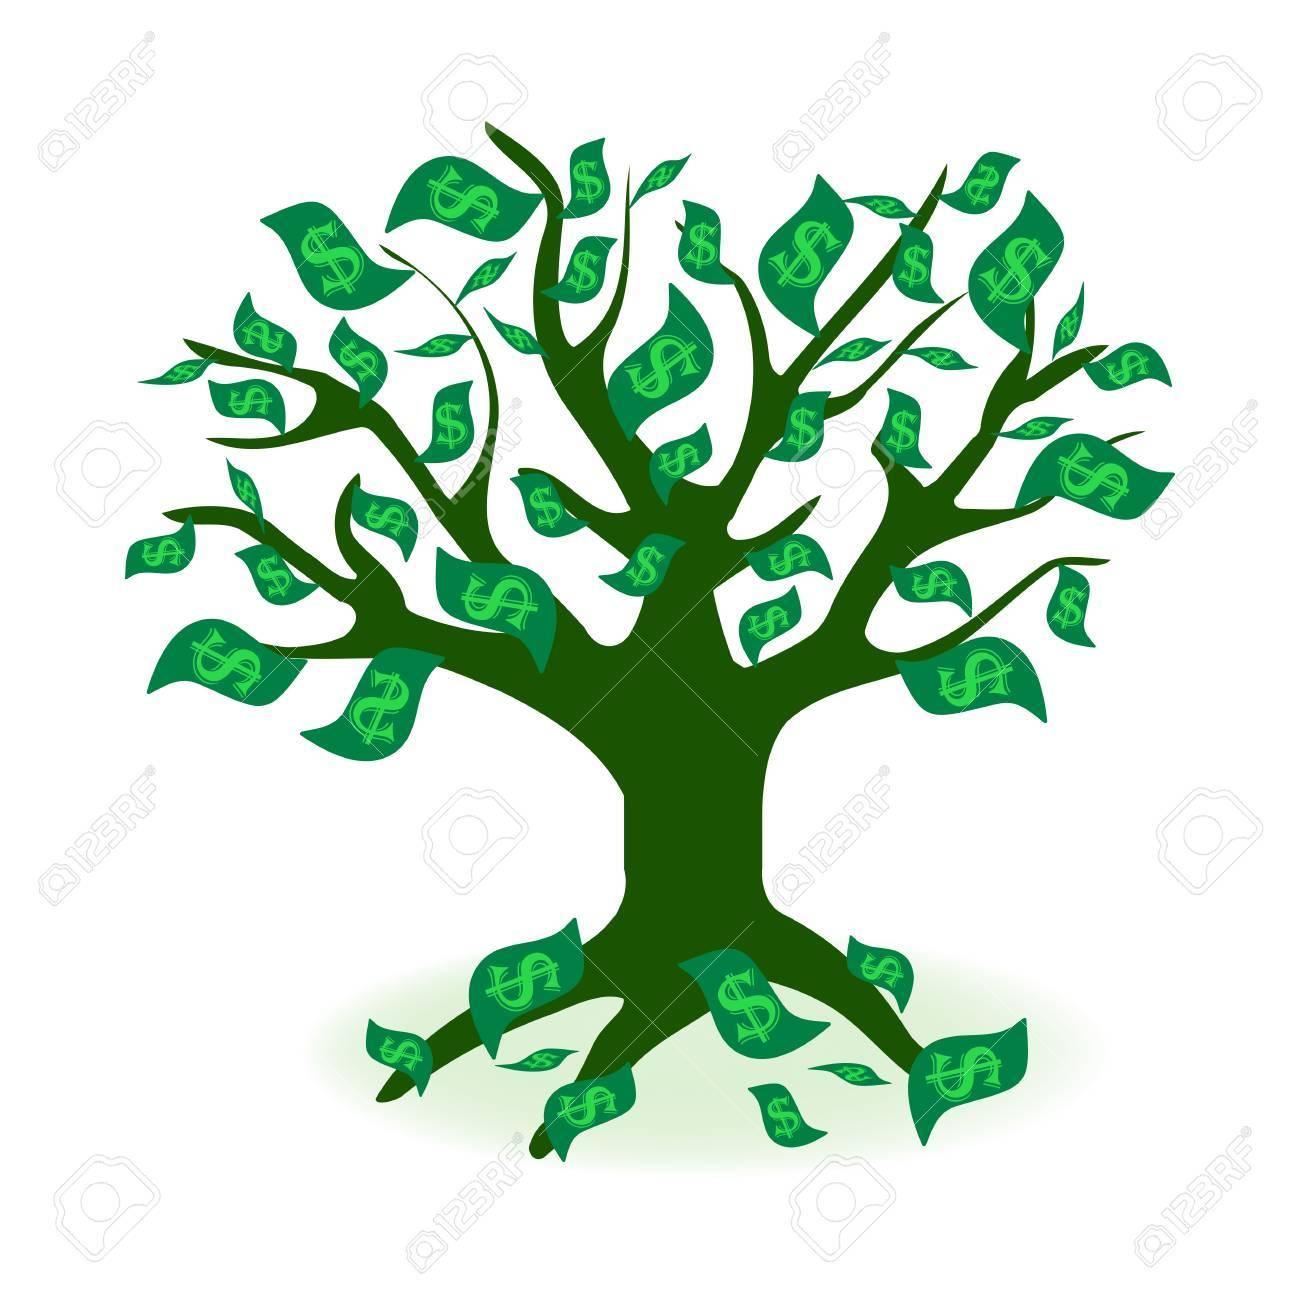 money tree prosperity symbol logo money tree icon symbol design